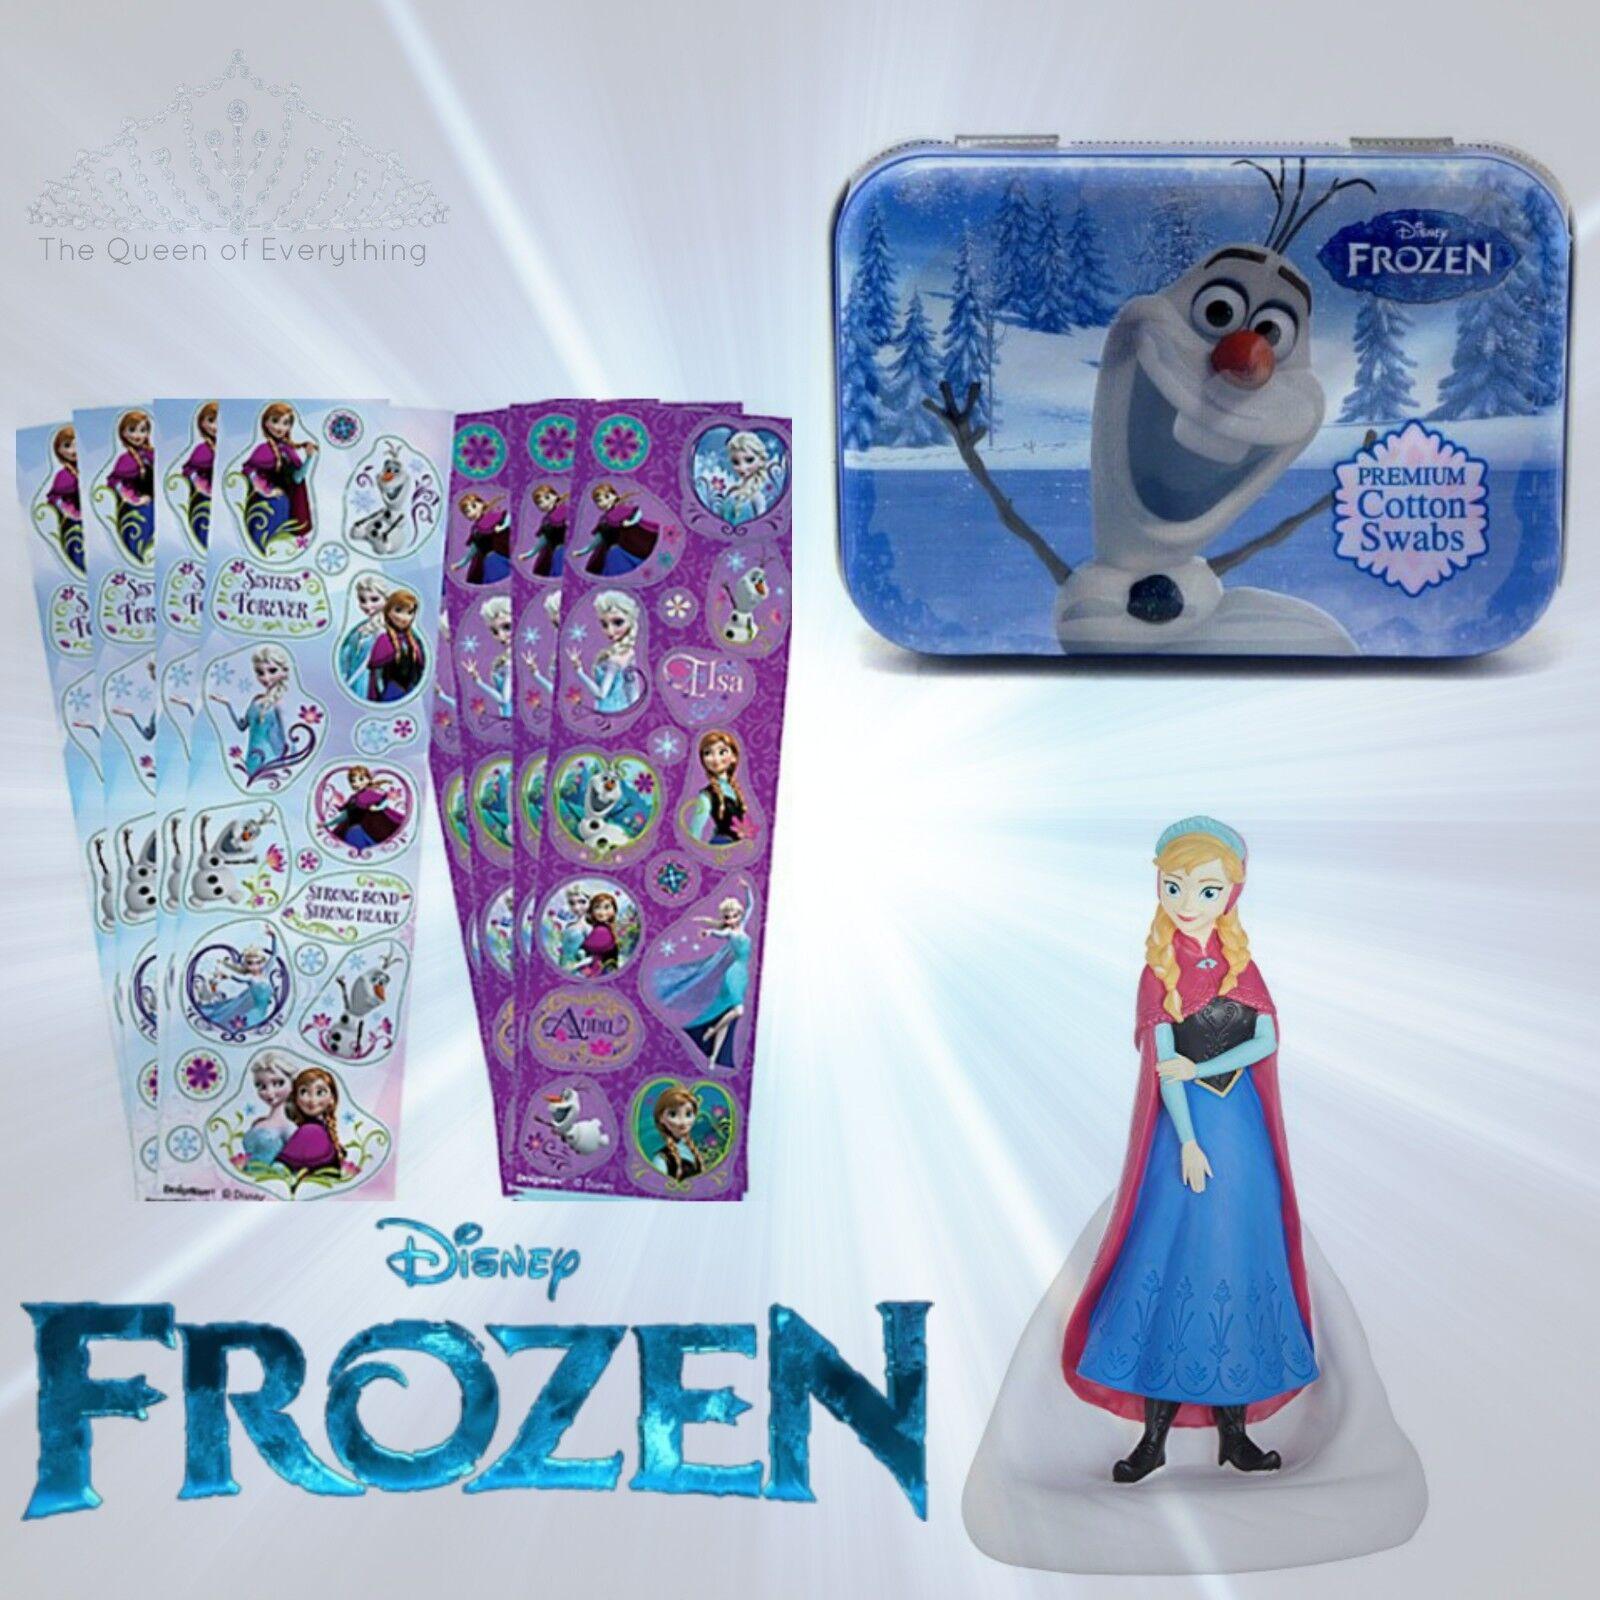 Disney Frozen 2 Party Favors Prizes Rewards Stocking Stuffer